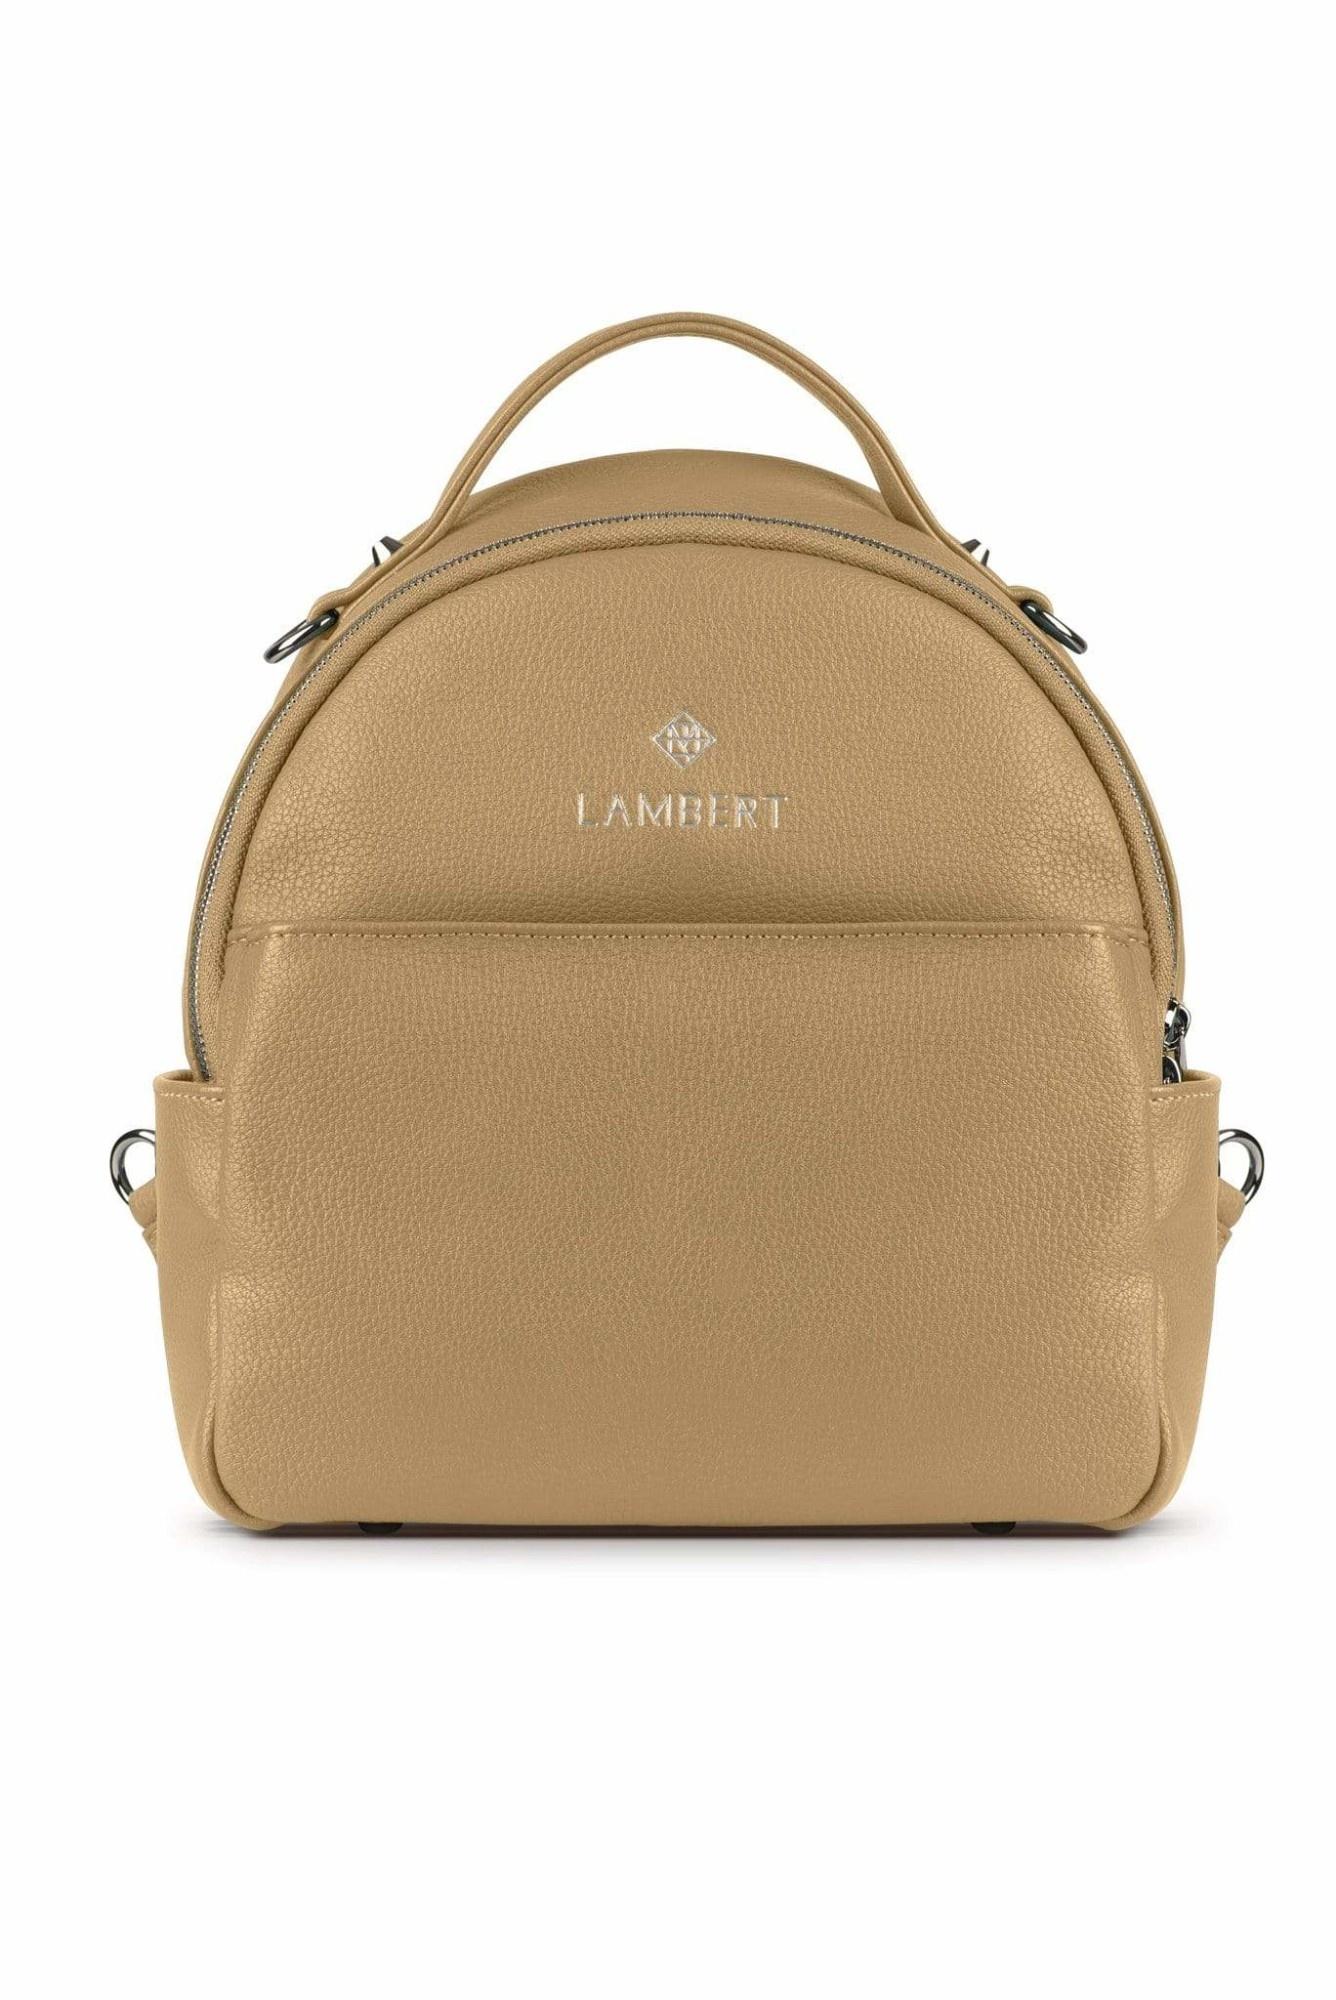 Lambert CHARLIE - Mini sac à dos en cuir vegan sand